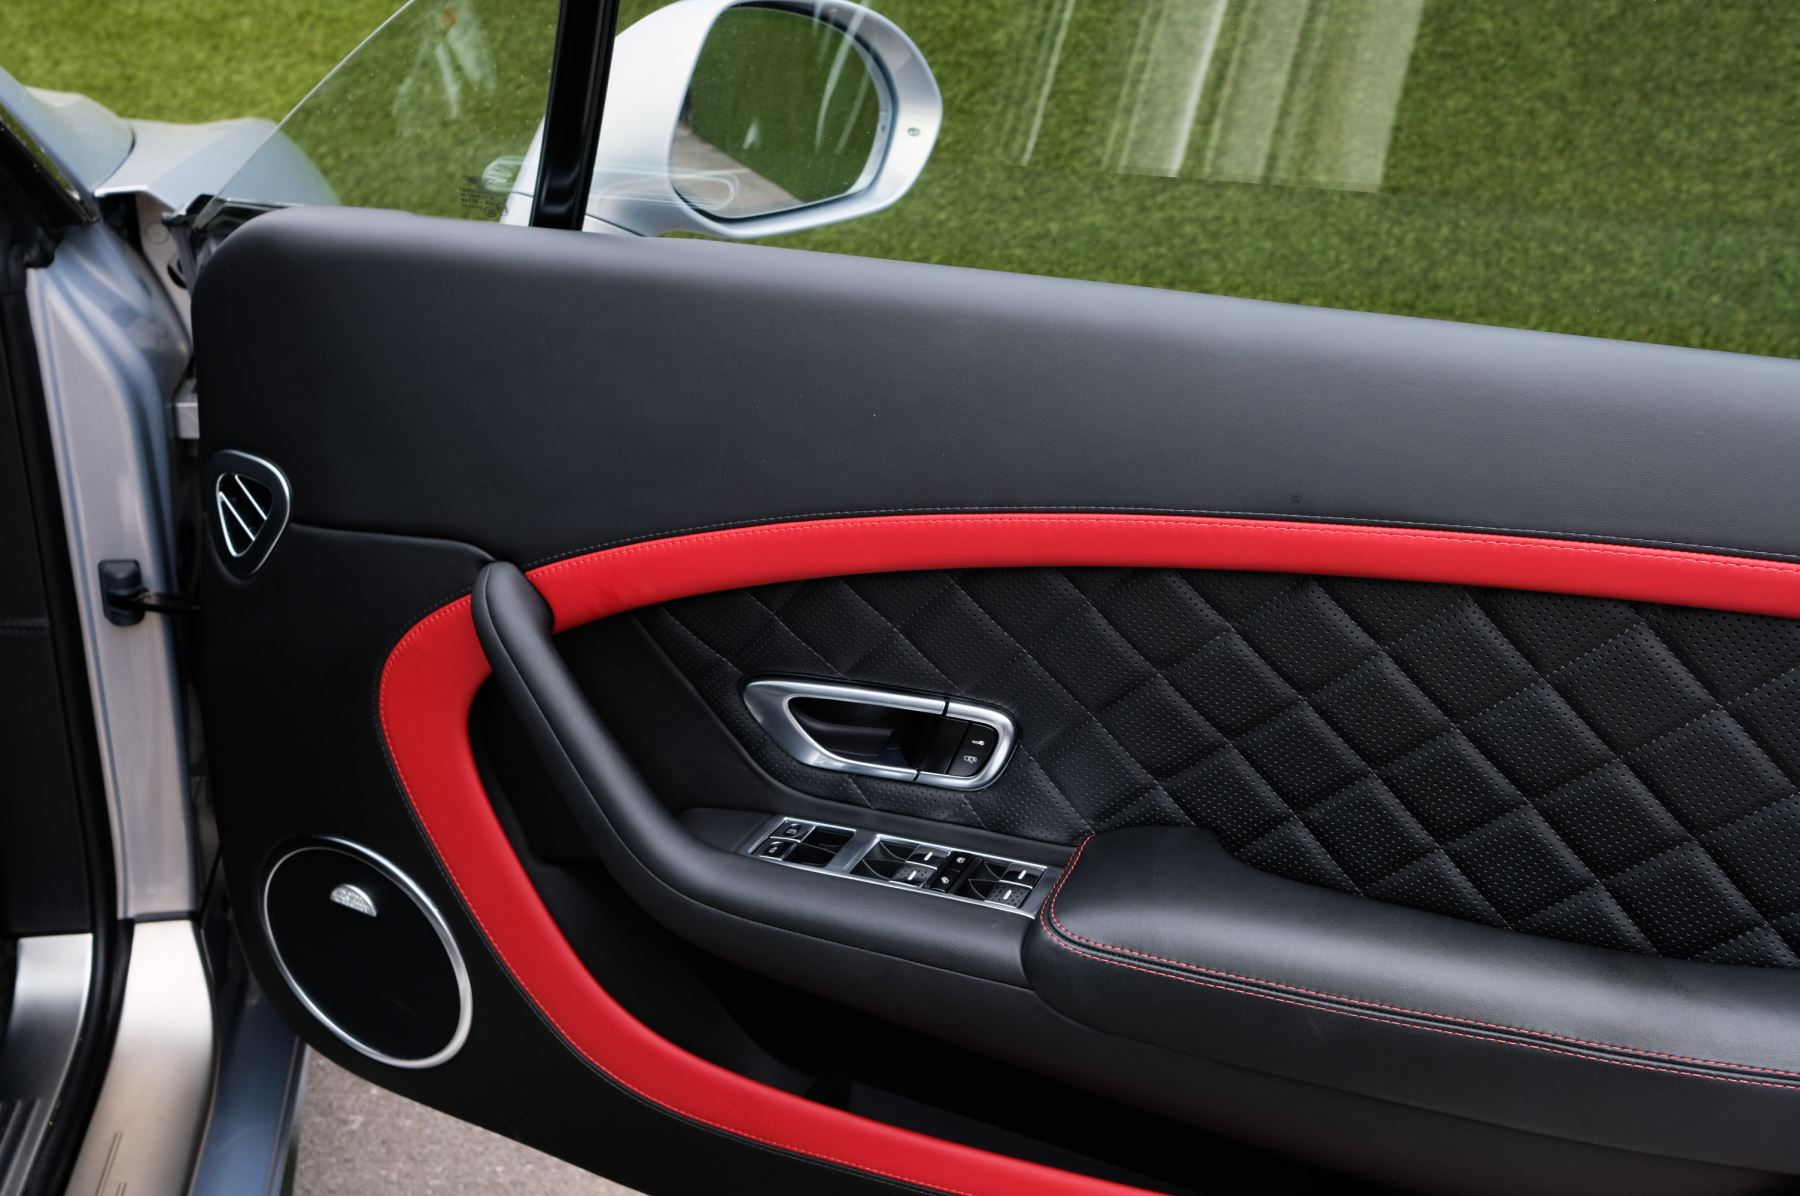 Bentley Continental GT 6.0 W12 [635] Speed - Premier Specification - Carbon Fibre Fascia Panels image 17